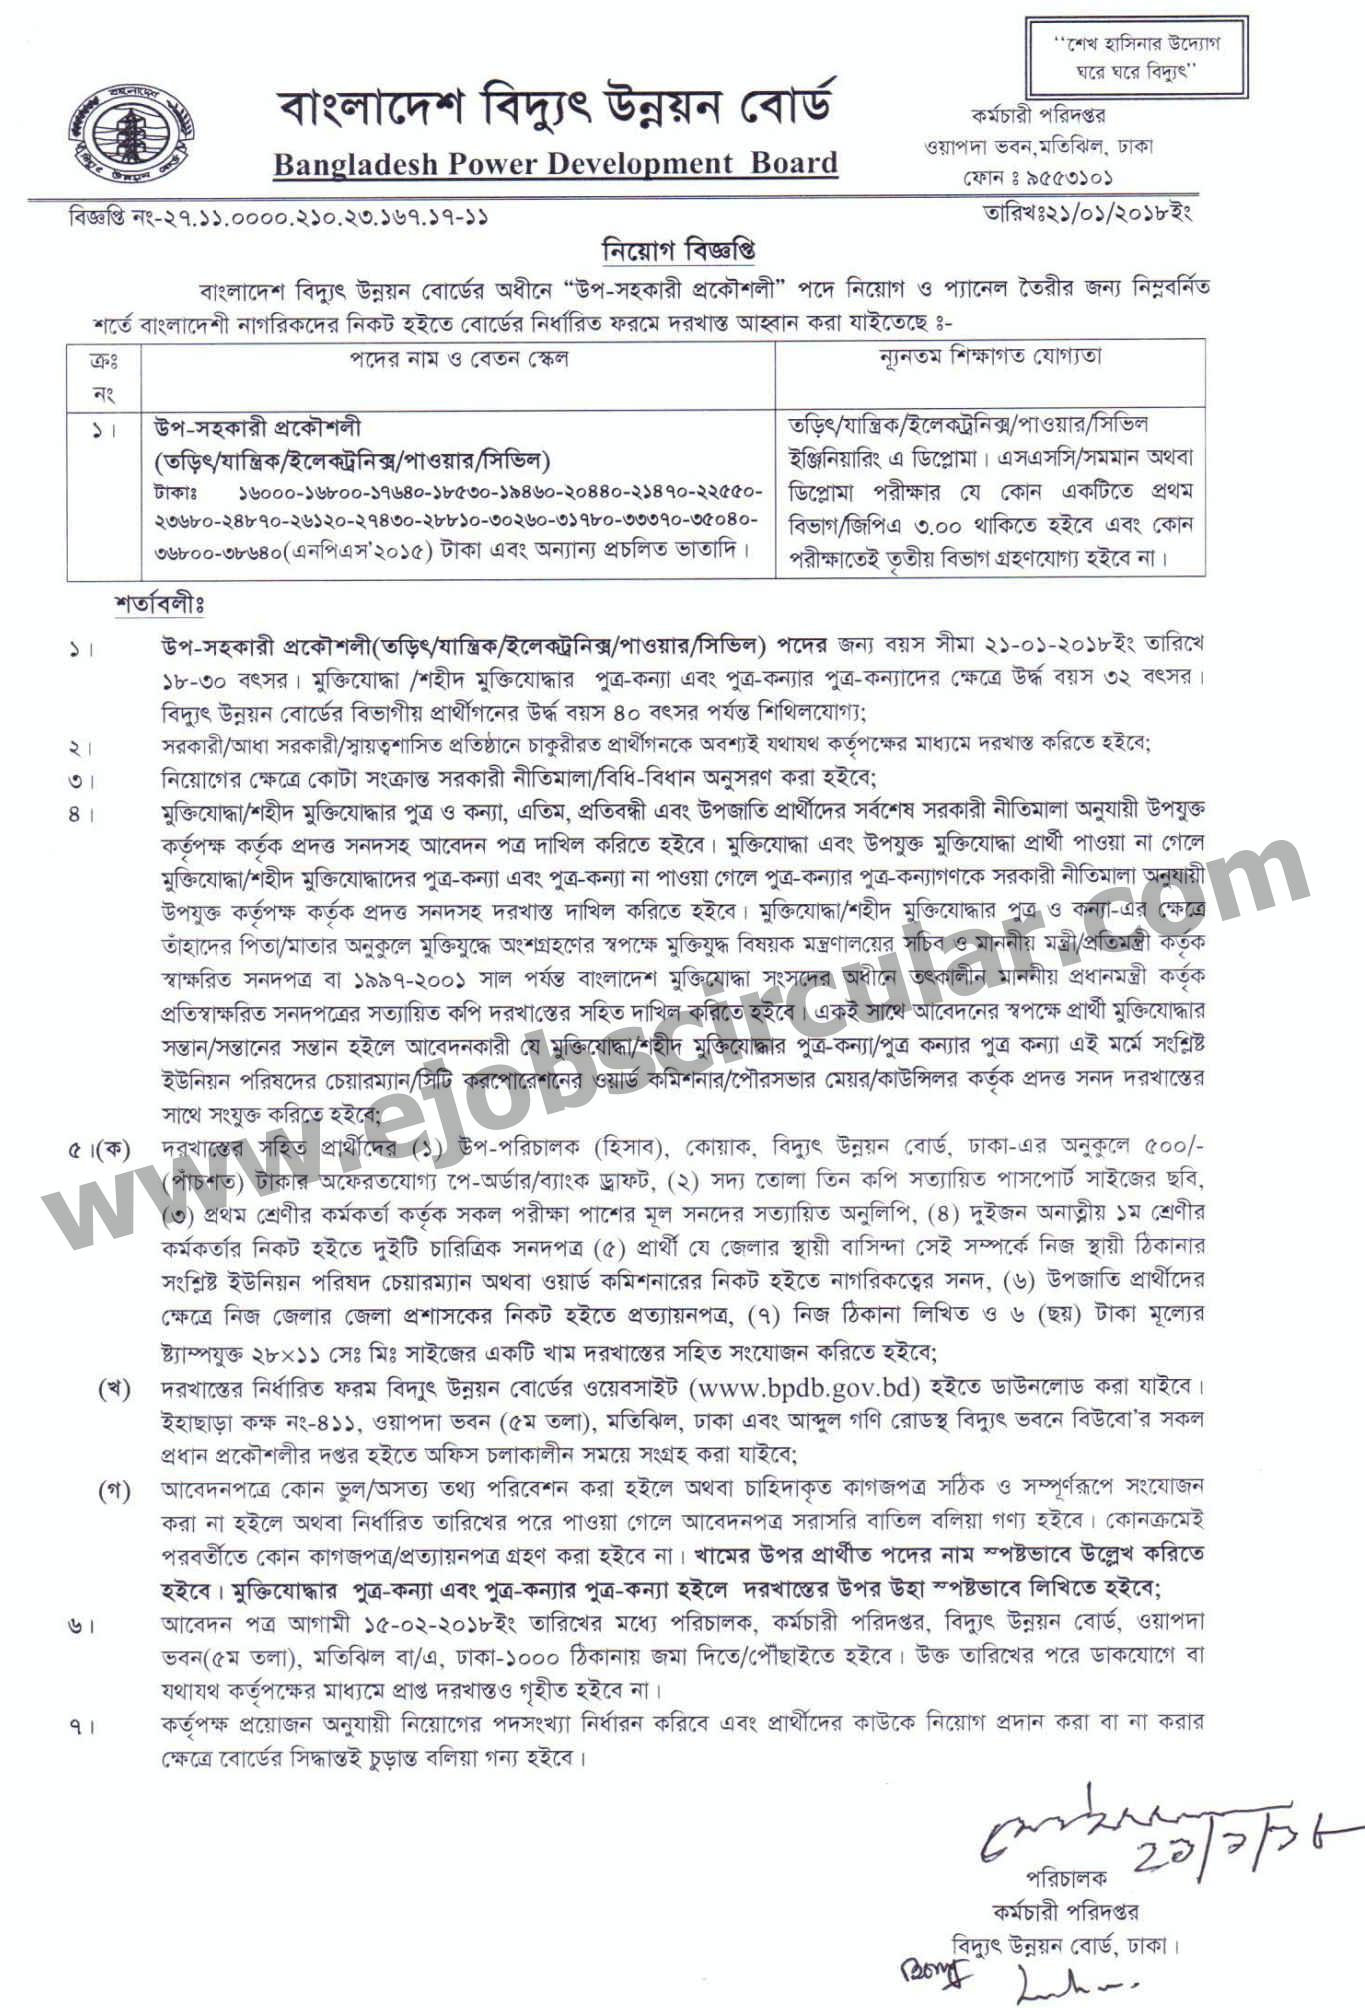 Bangladesh Power Development Board BPDB Job circular 2018